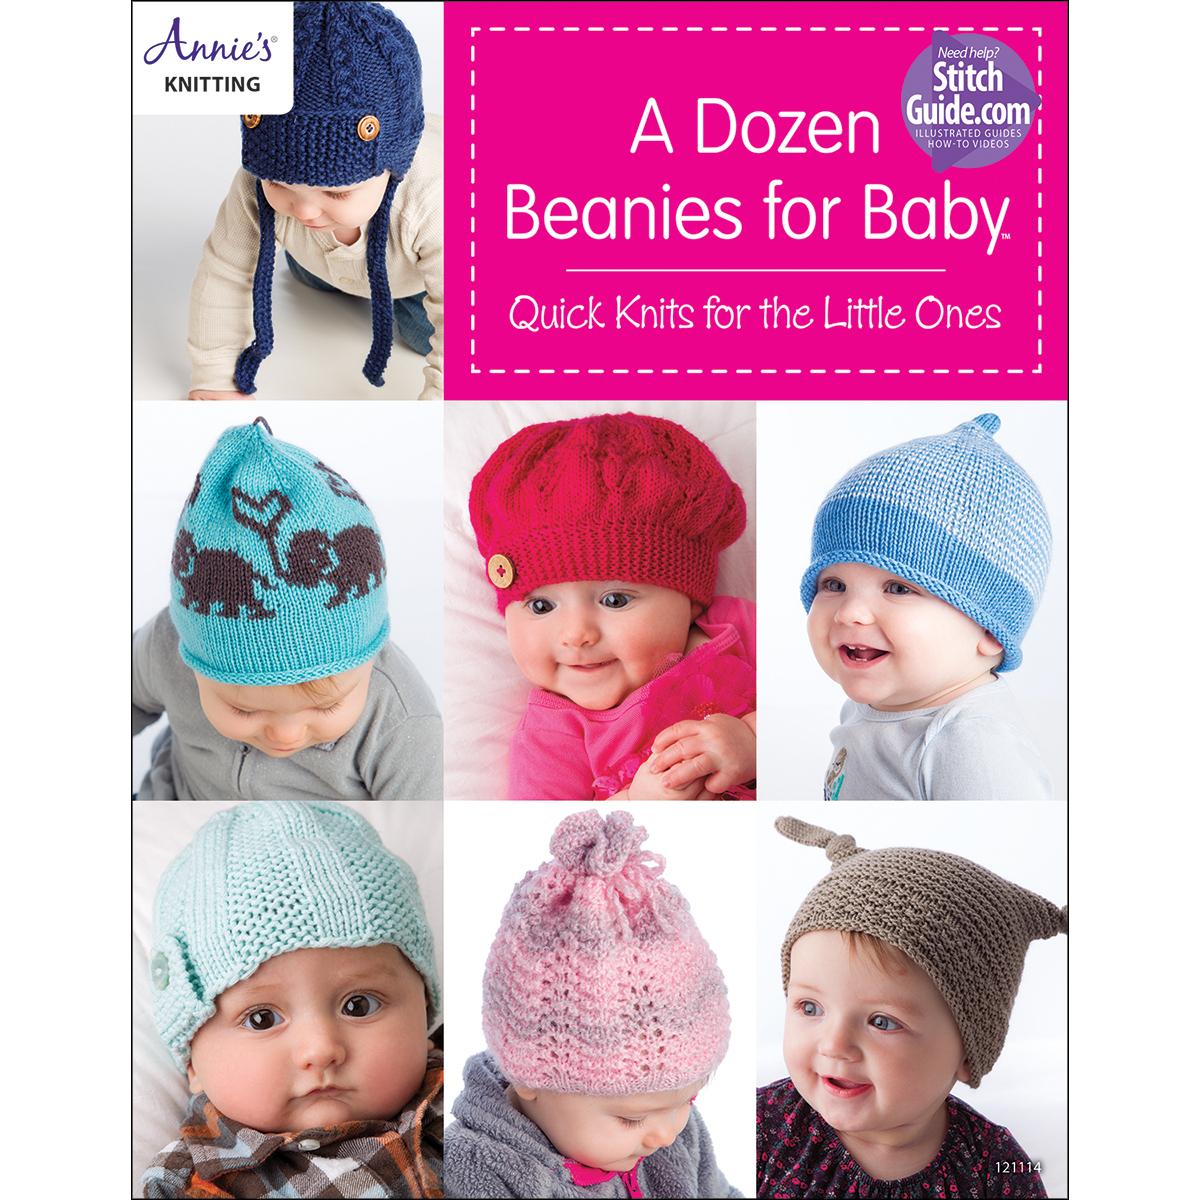 Annie's Books-A Dozen Beanies For Baby